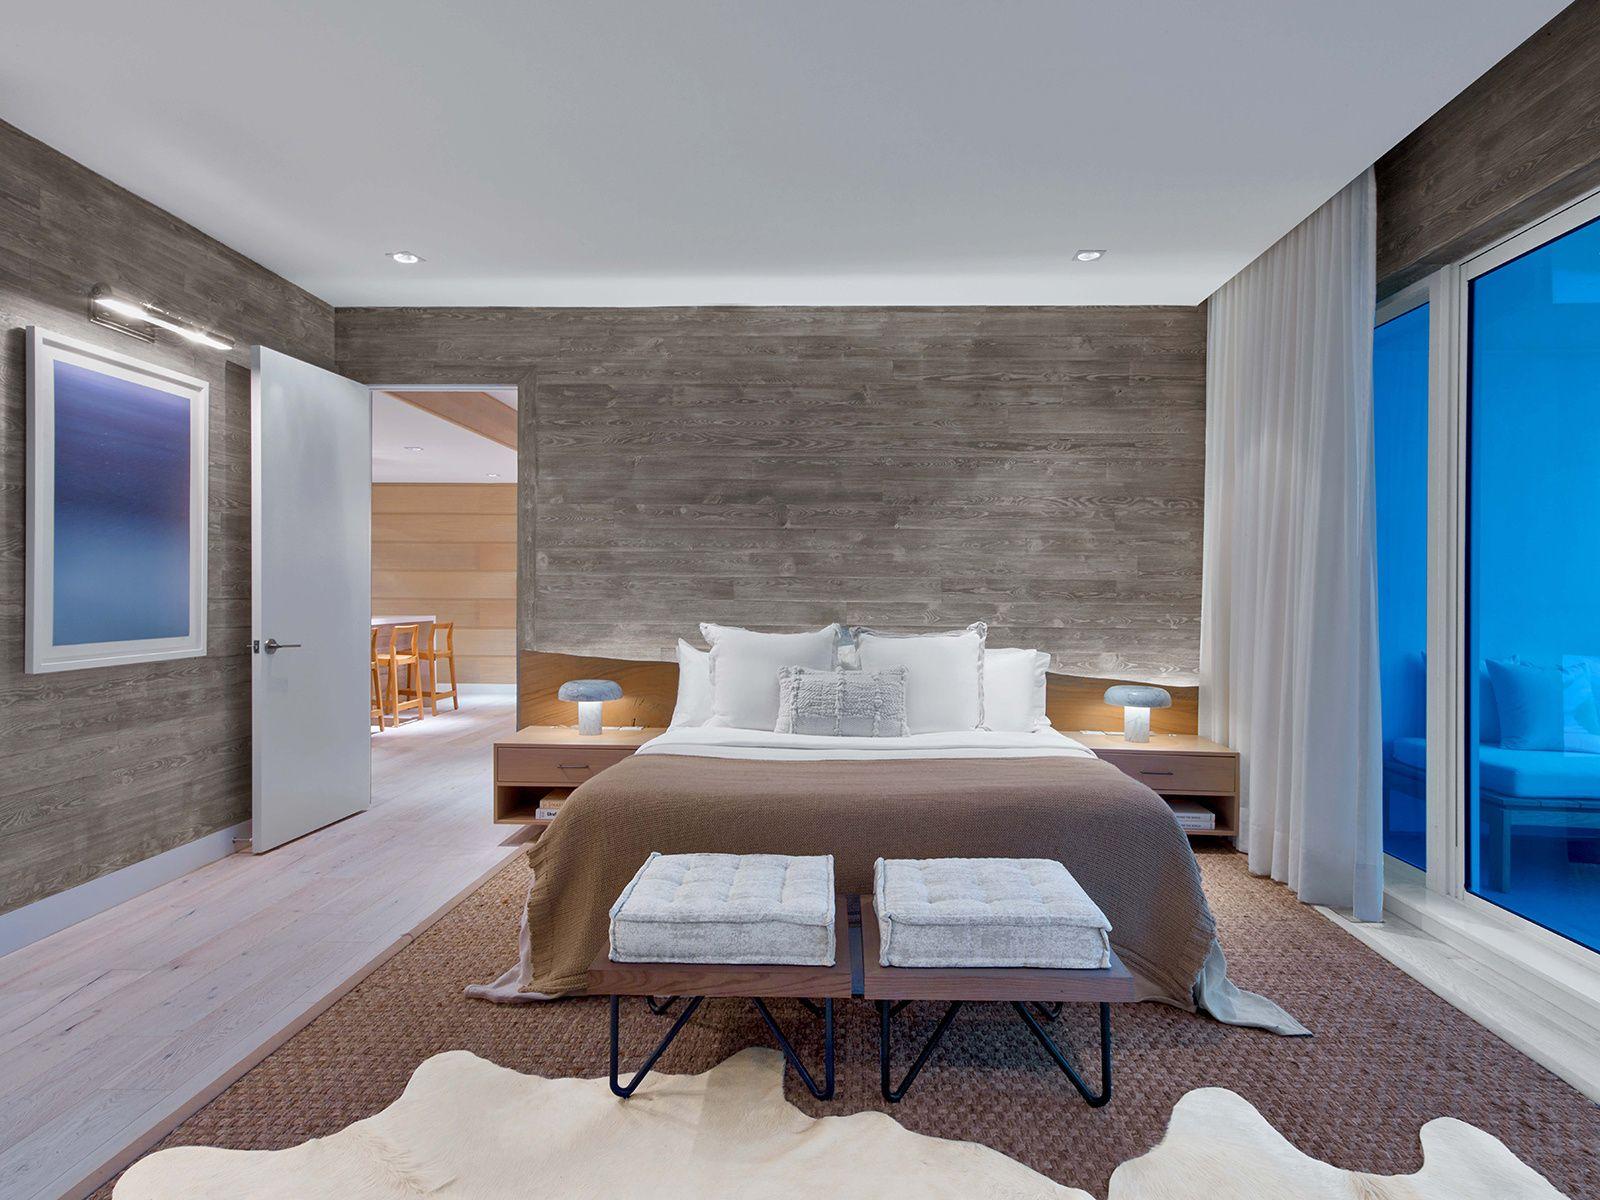 atico_en_1_hotel_south_beach_miami_855372559_1600x1200.jpg (1600×1200)